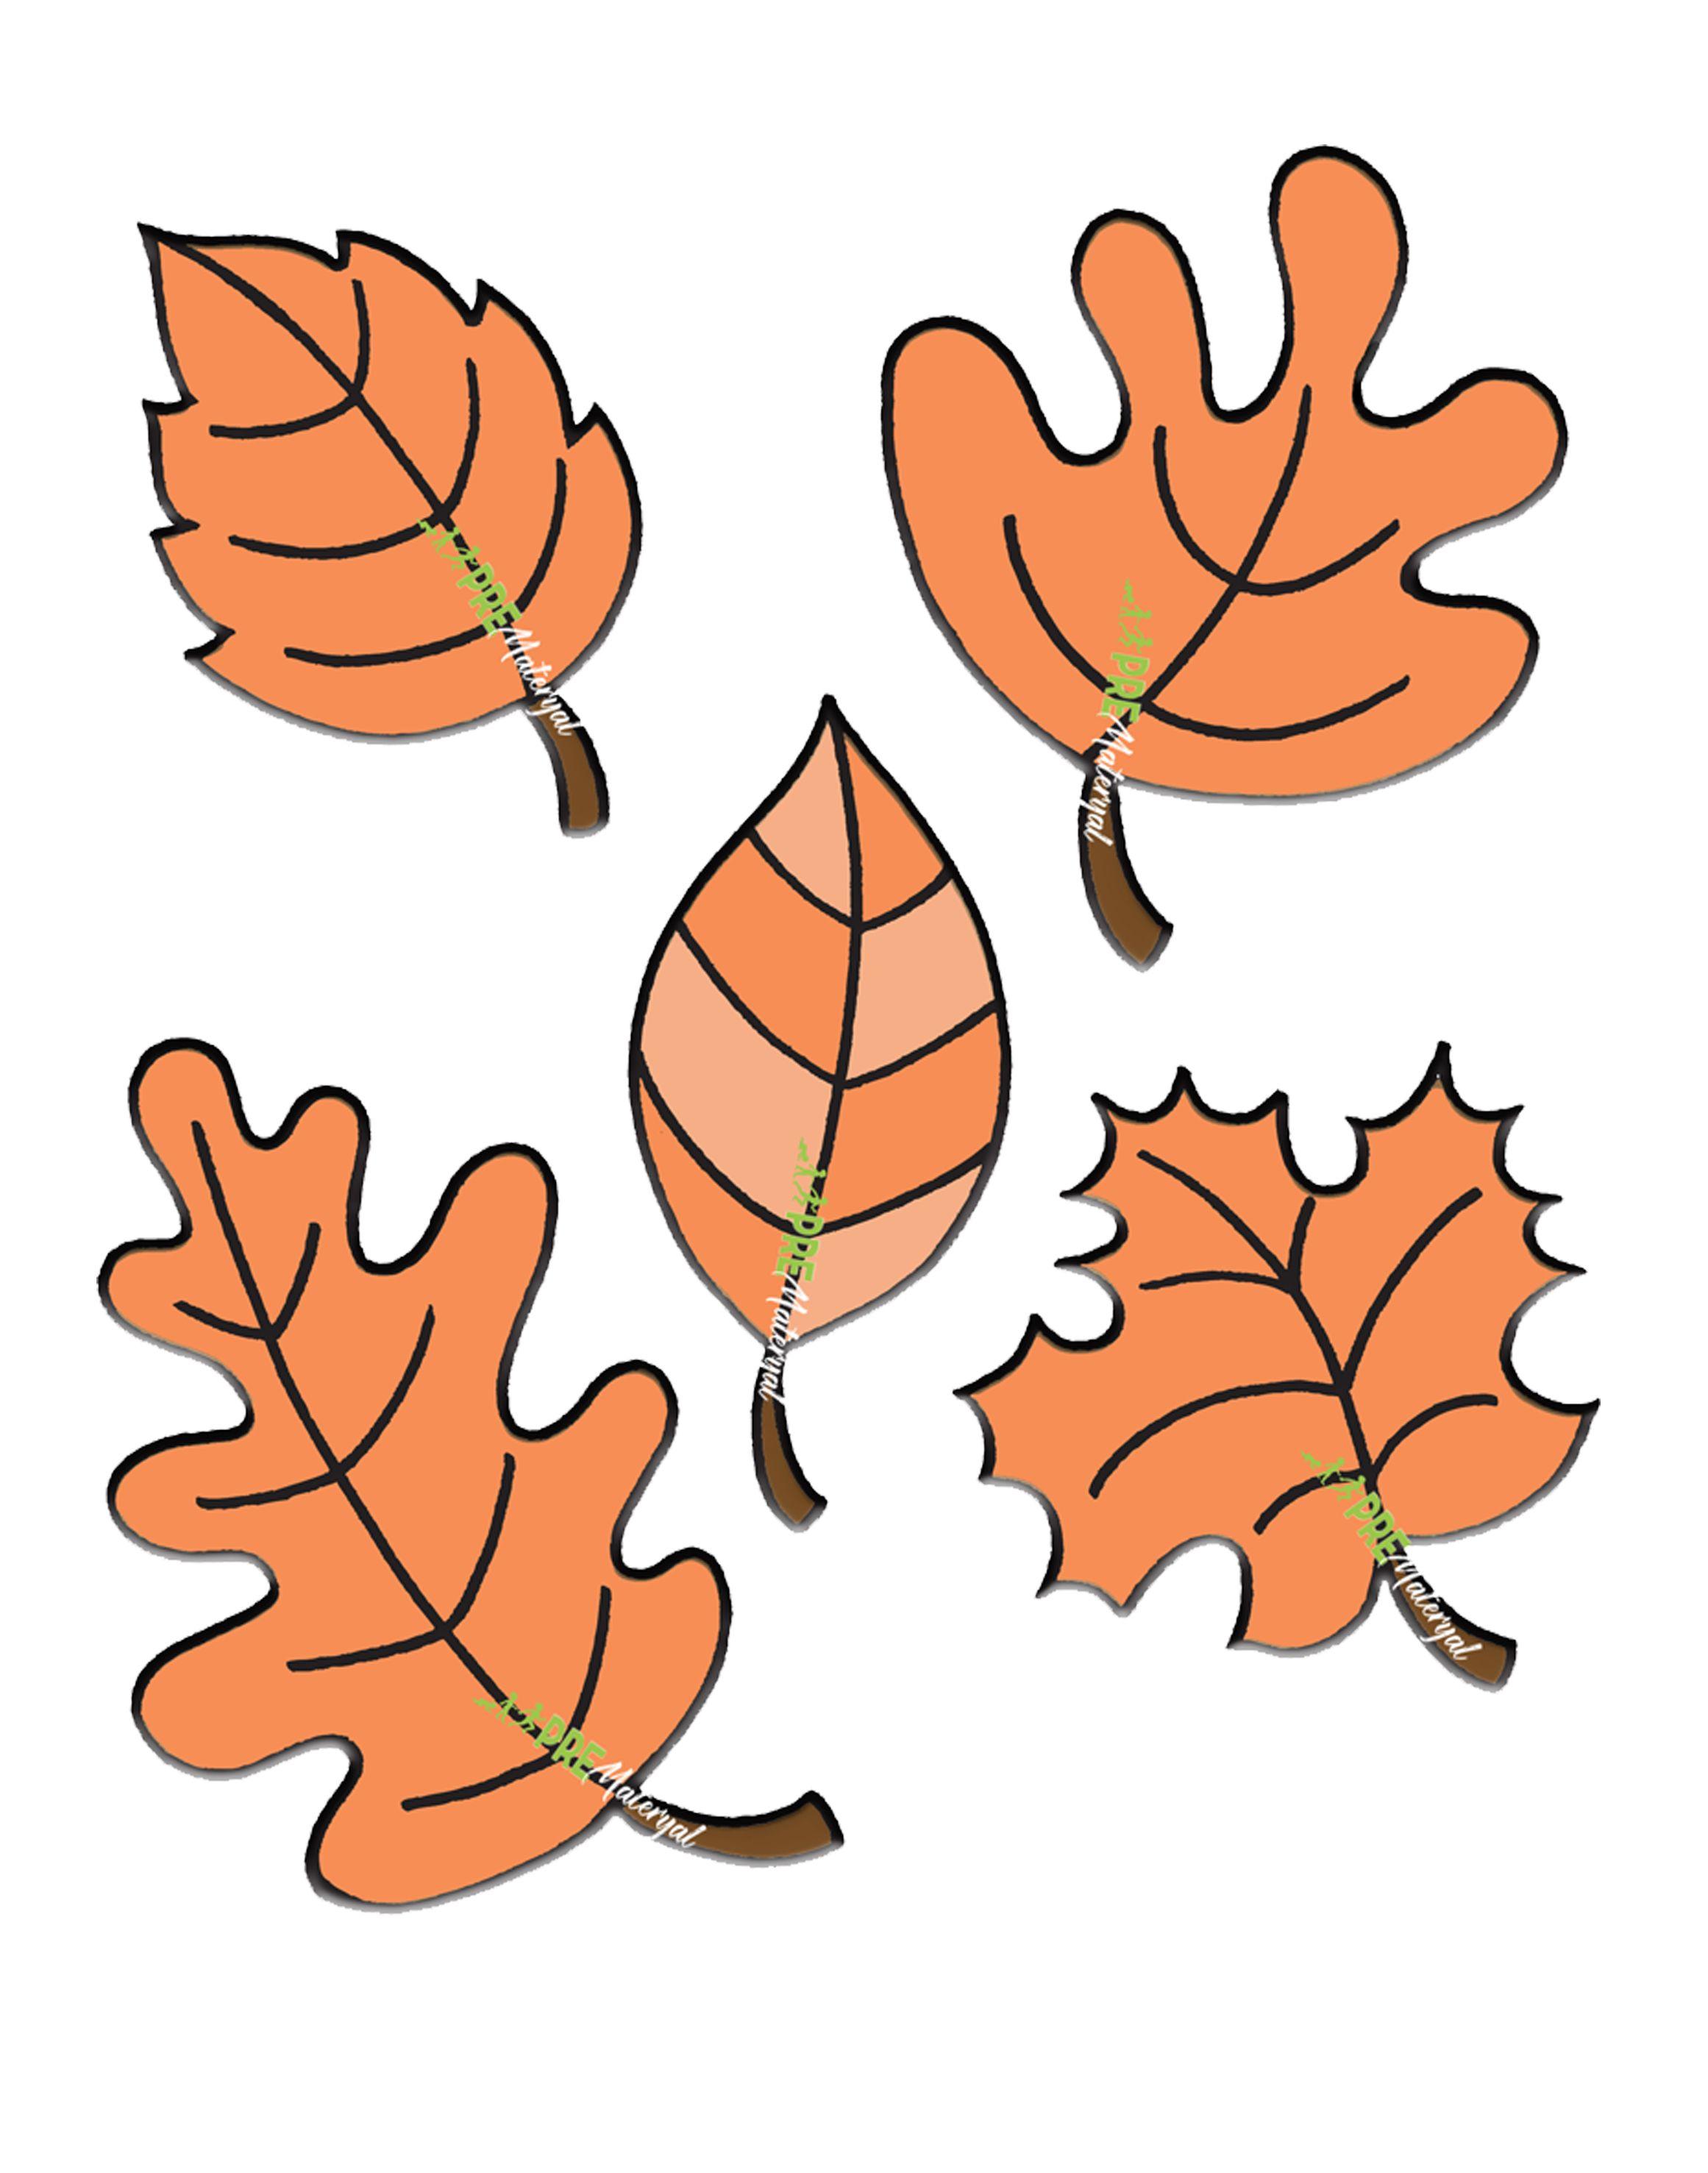 Renkli Yapraklar Premateryal Sonbahar Yapraklar Autumn Fall Leaf Yaprak Sonbahar